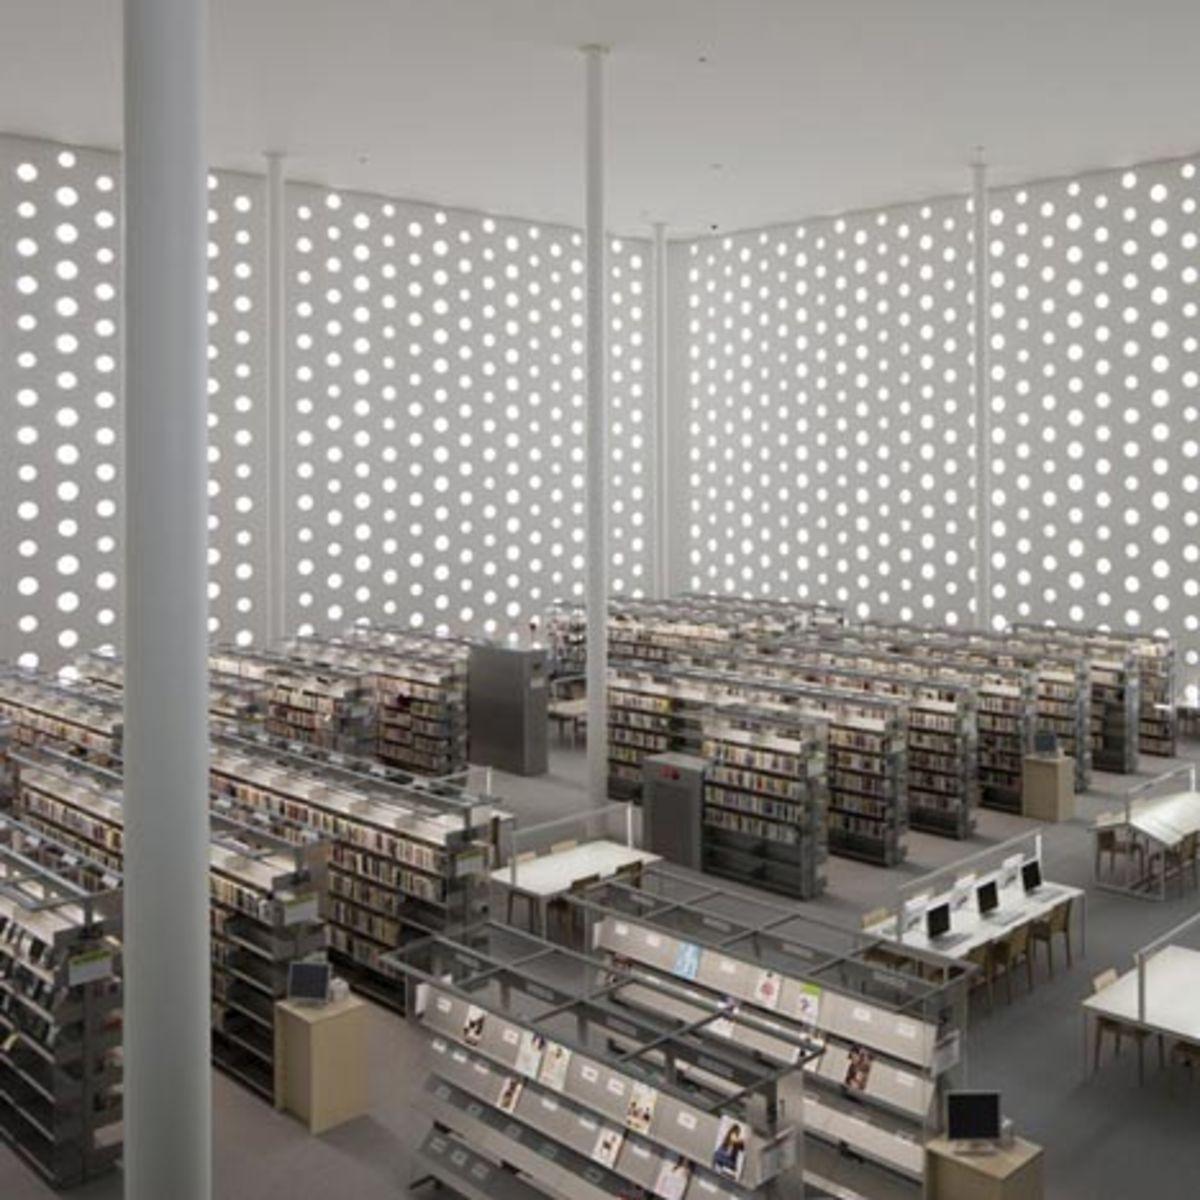 coolest-libraries-around-the-world